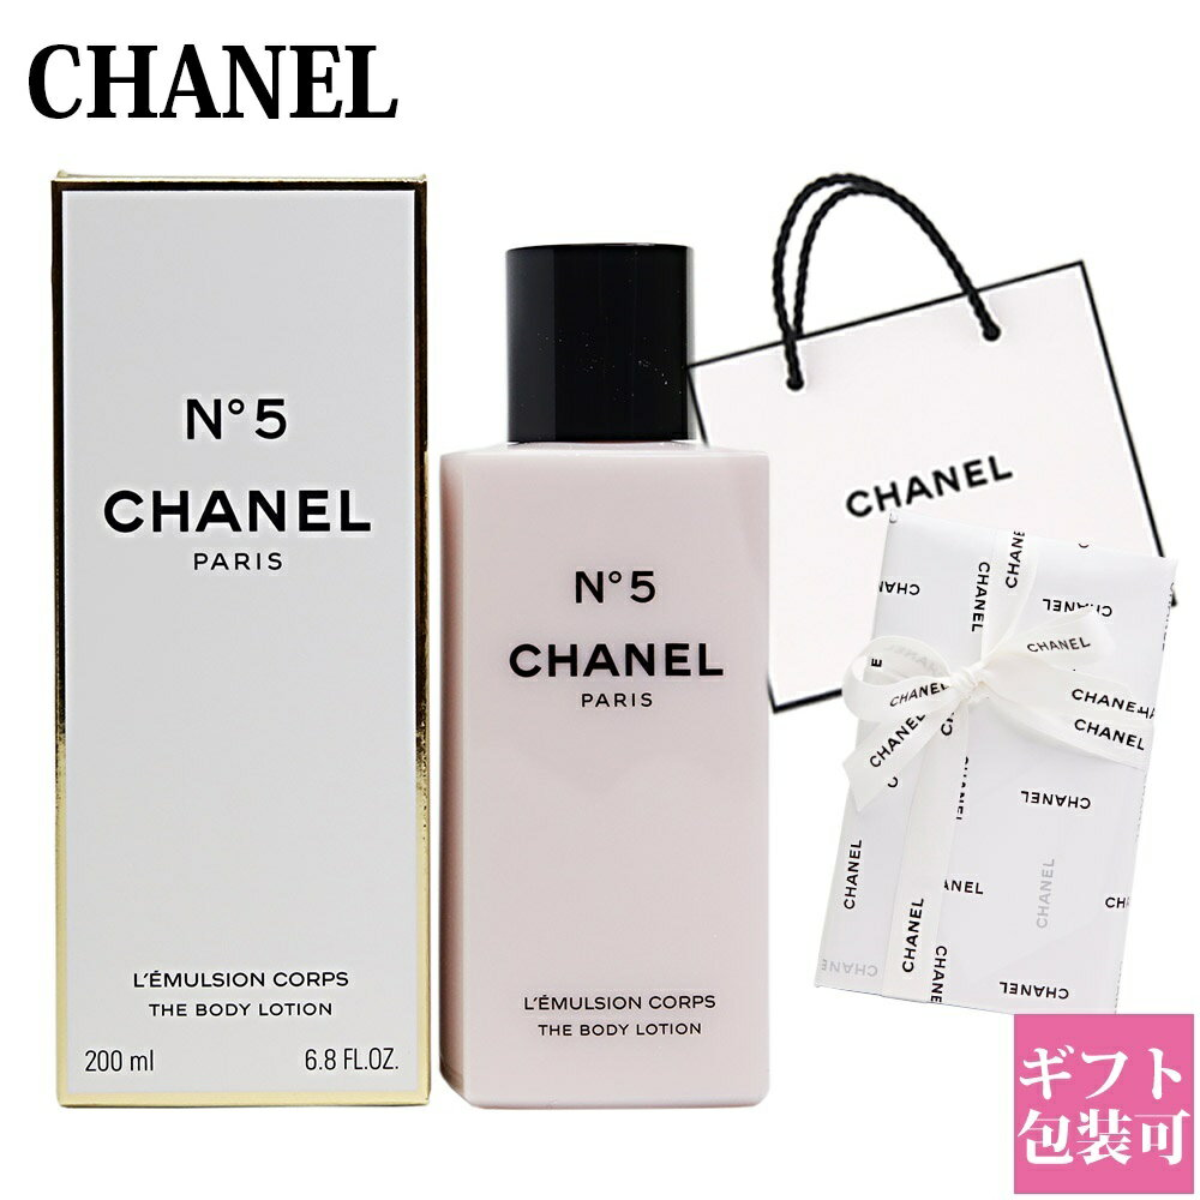 CHANEL 乳液 No5 no,5 200ml CHANEL N5 2020